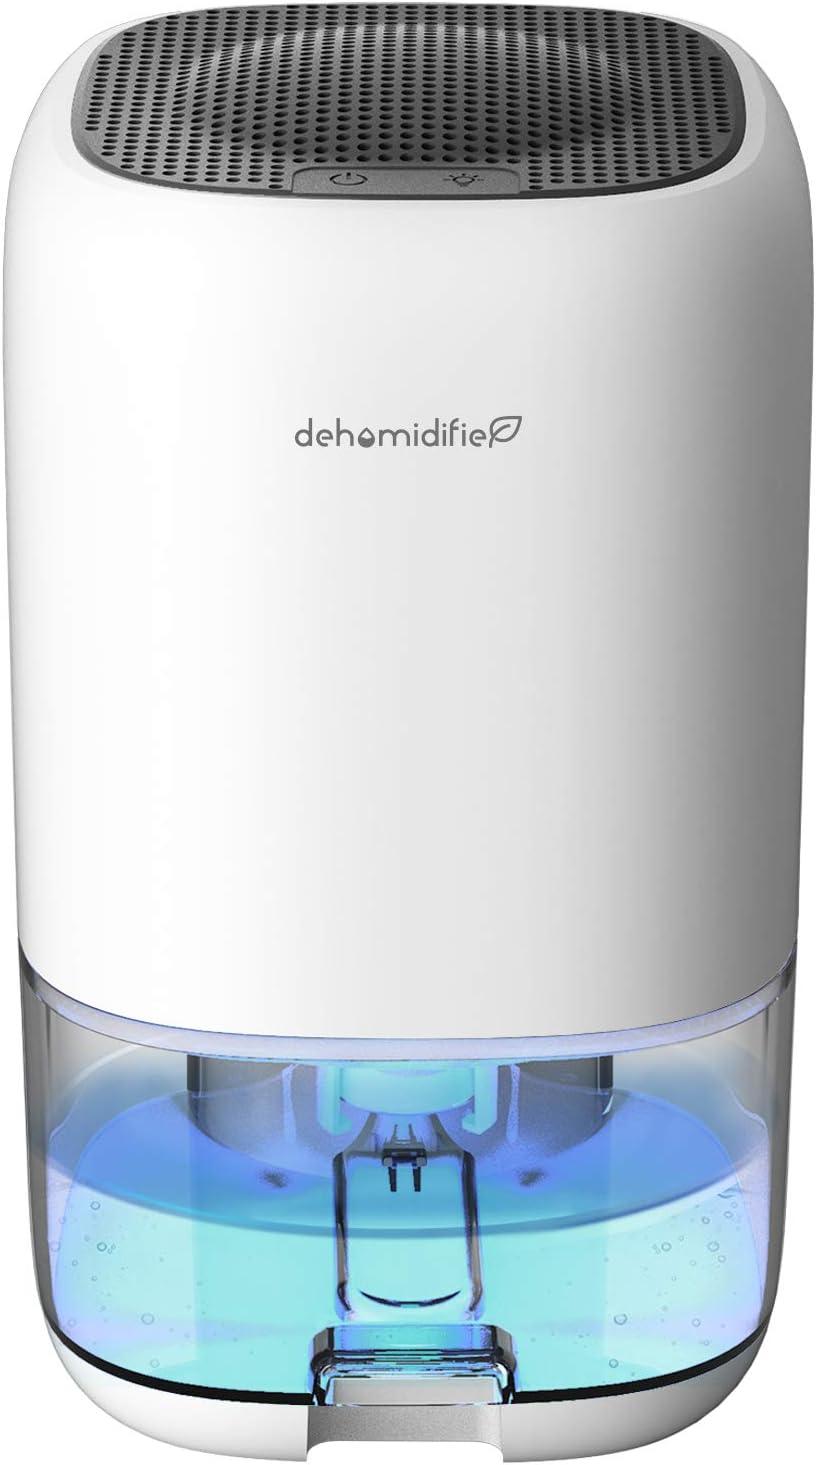 ALROCKET Dehumidifier 35oz(1000ml) Small Dehumidifier